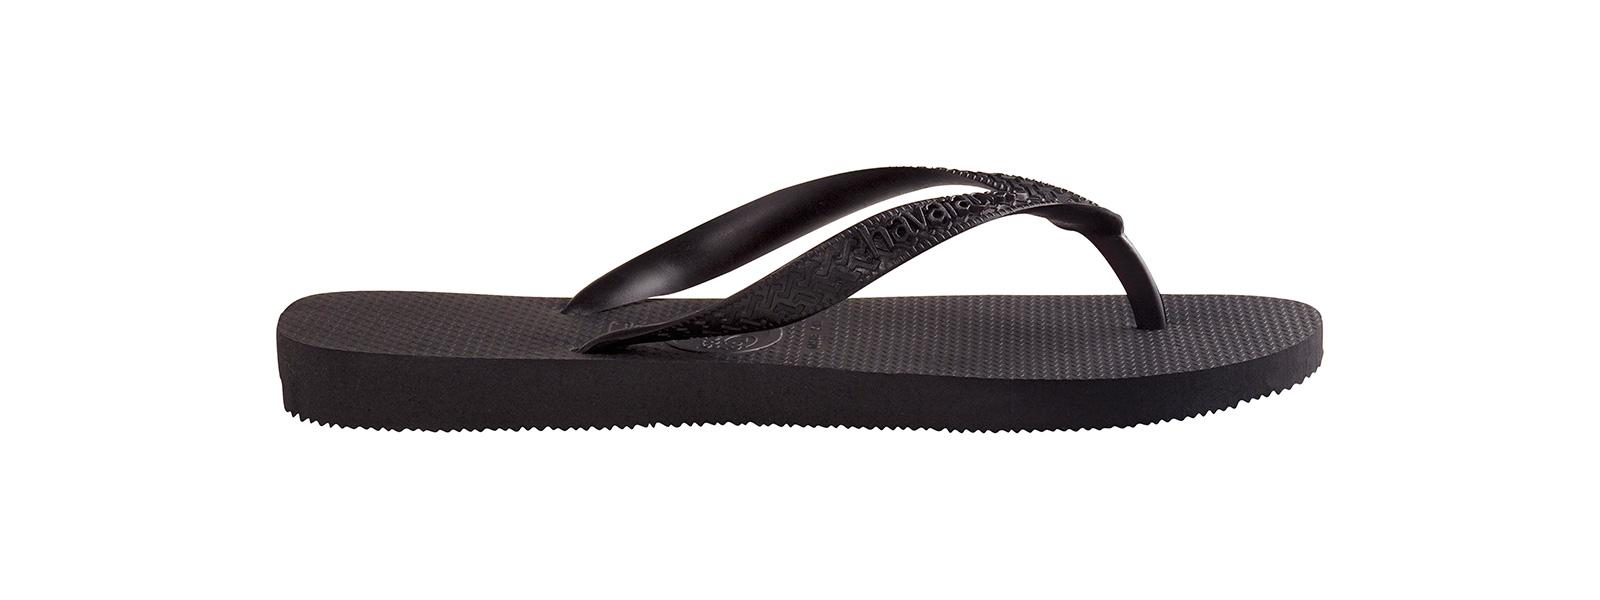 Havaianas Top Chaussures Tongs-Noir Toutes Tailles